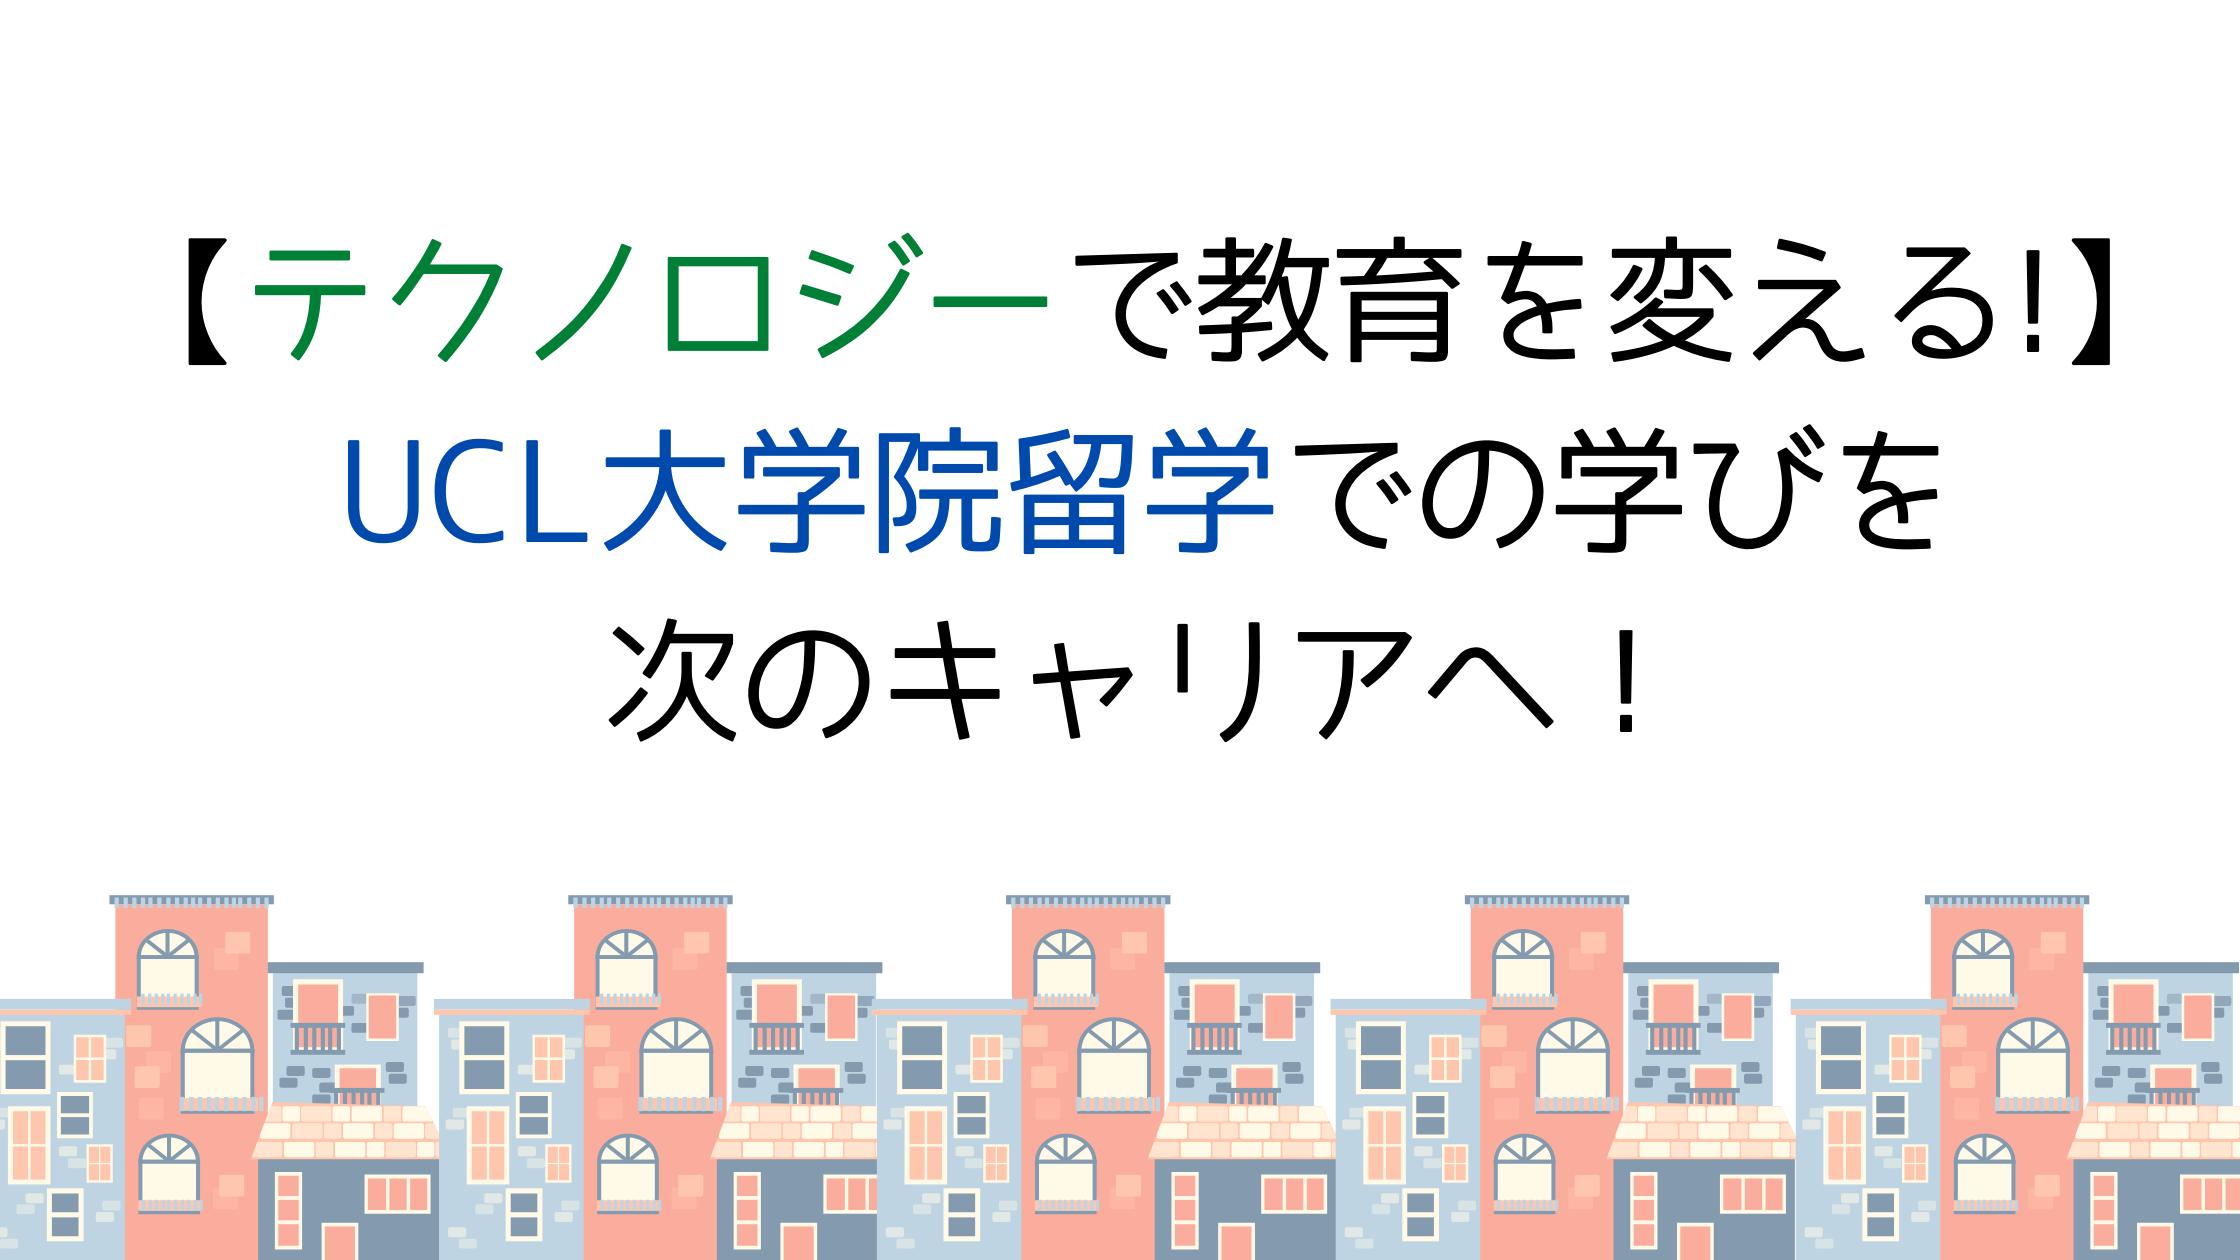 UCL Matsumoto san